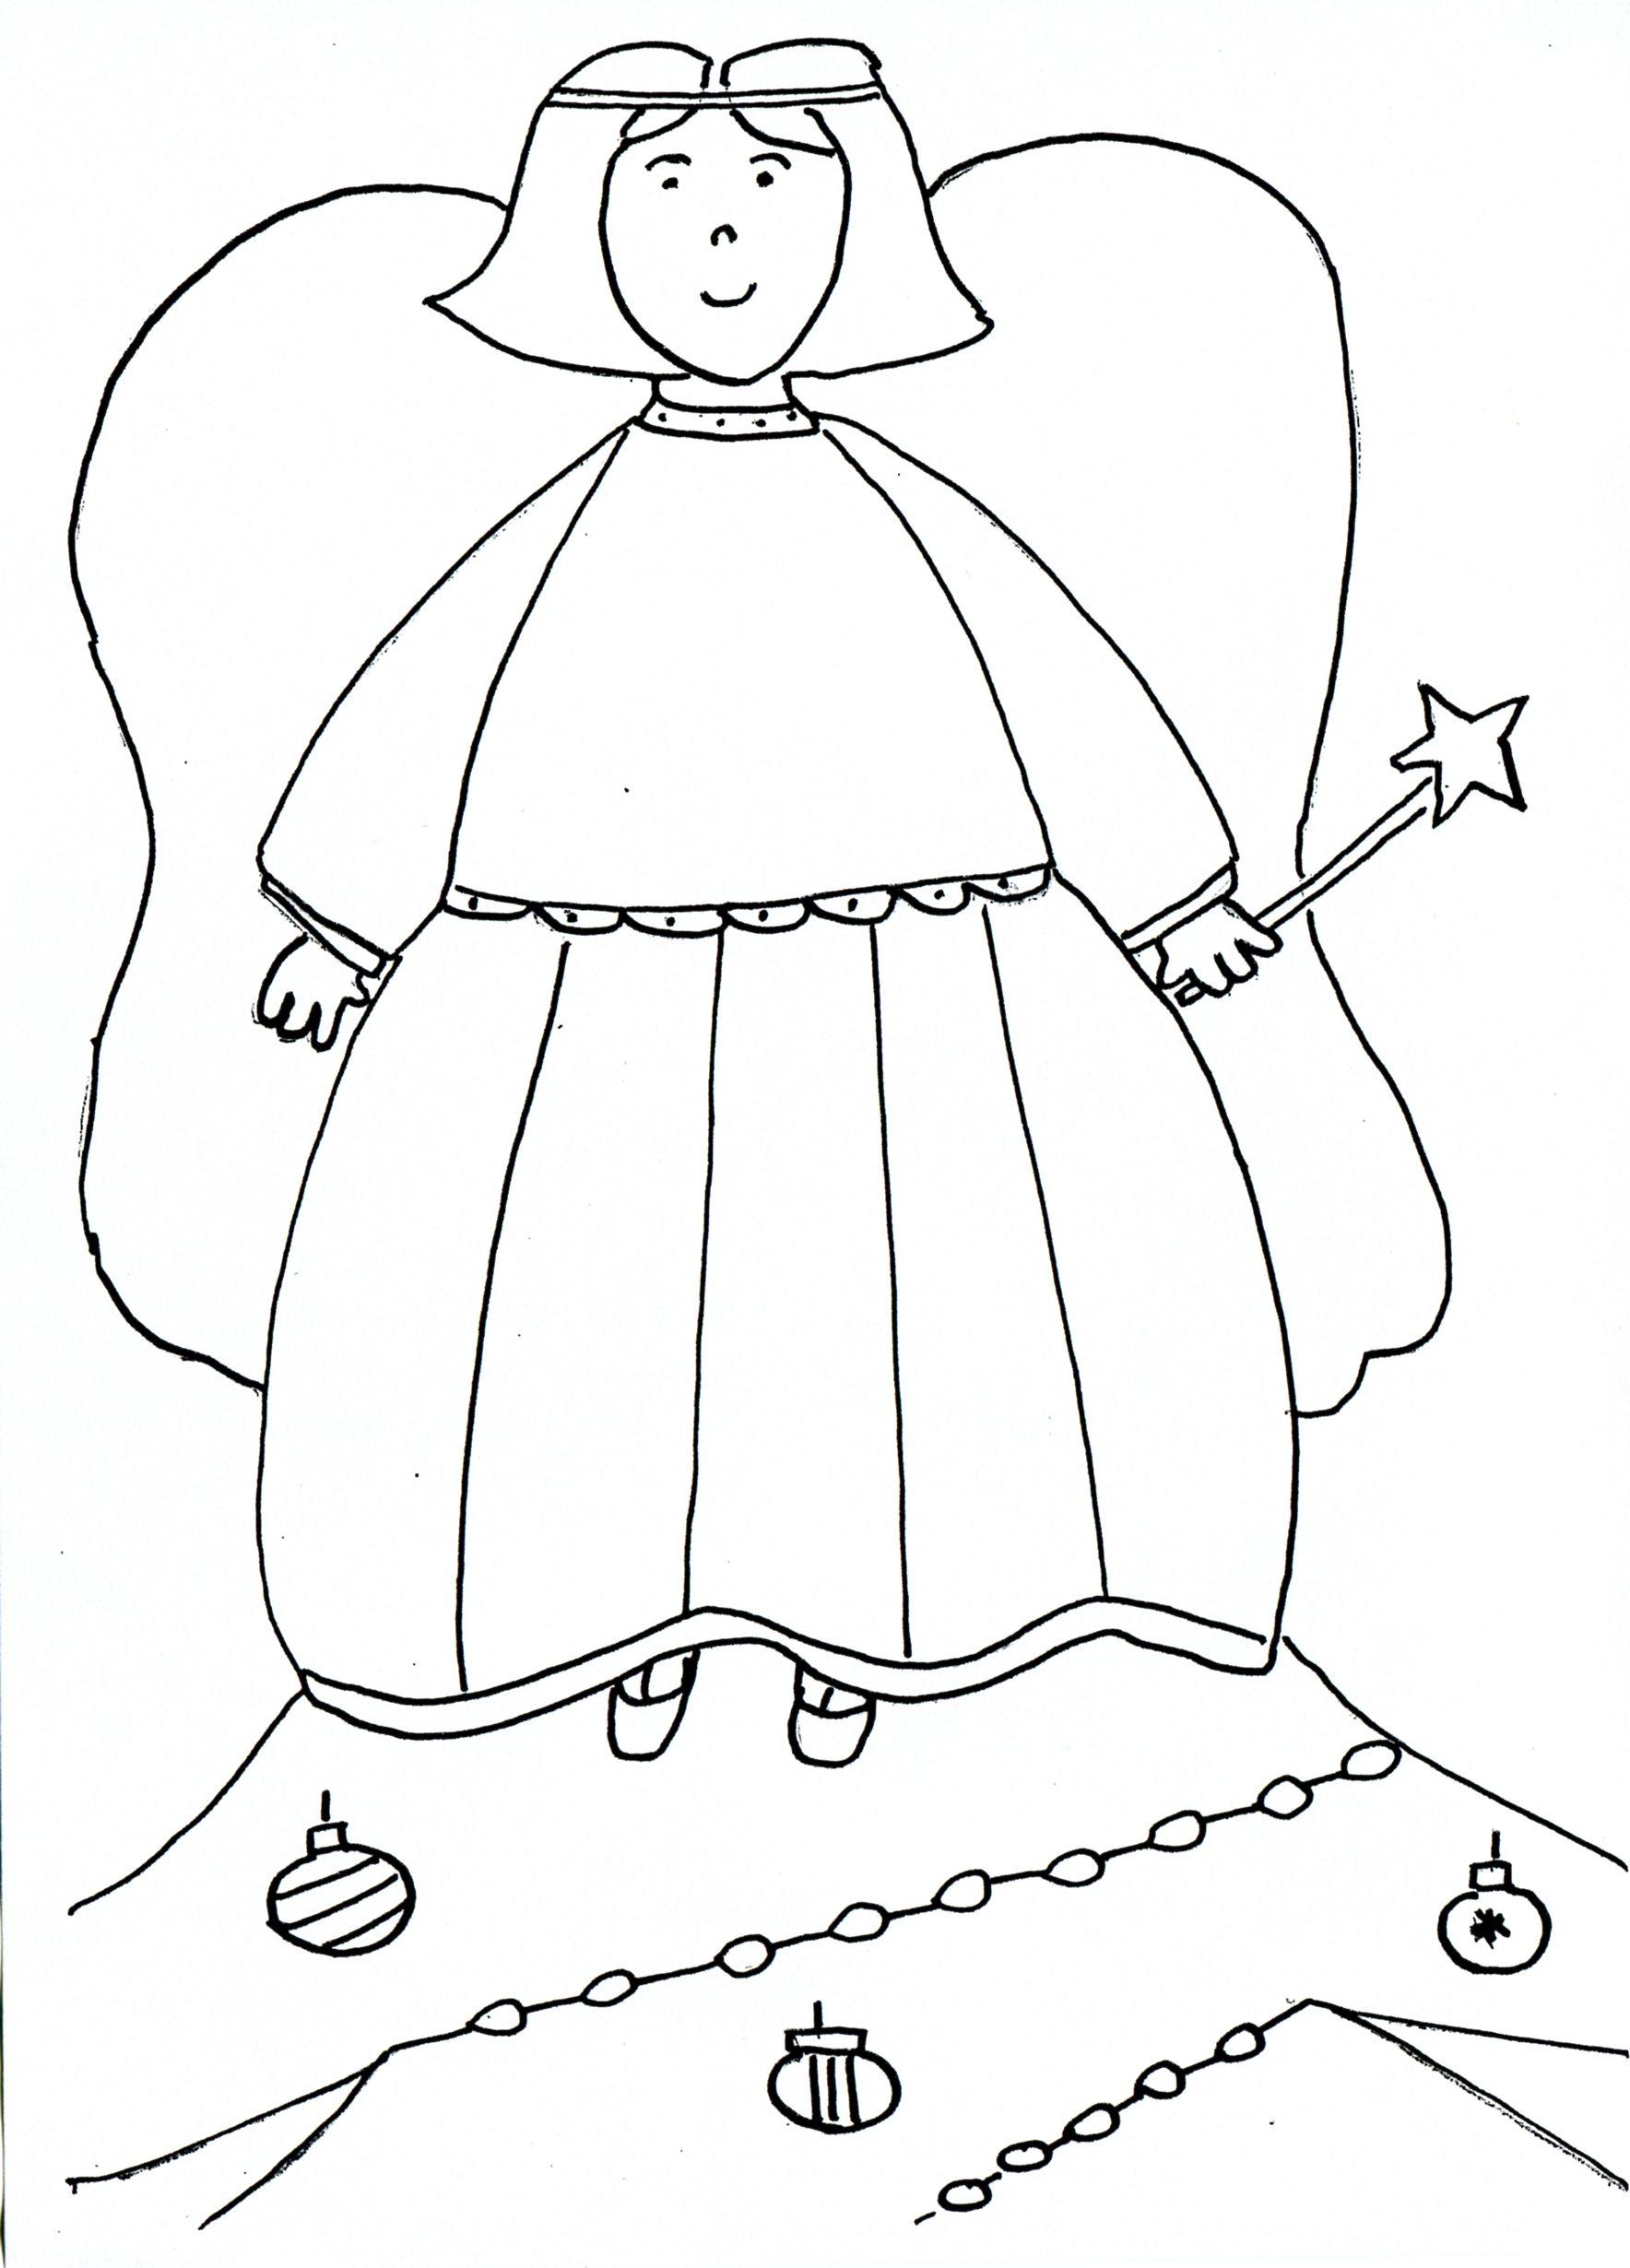 1768x2460 Teddy Bear Drawings Teddy Bears Picnic Lily P Chic. Baby Monkey